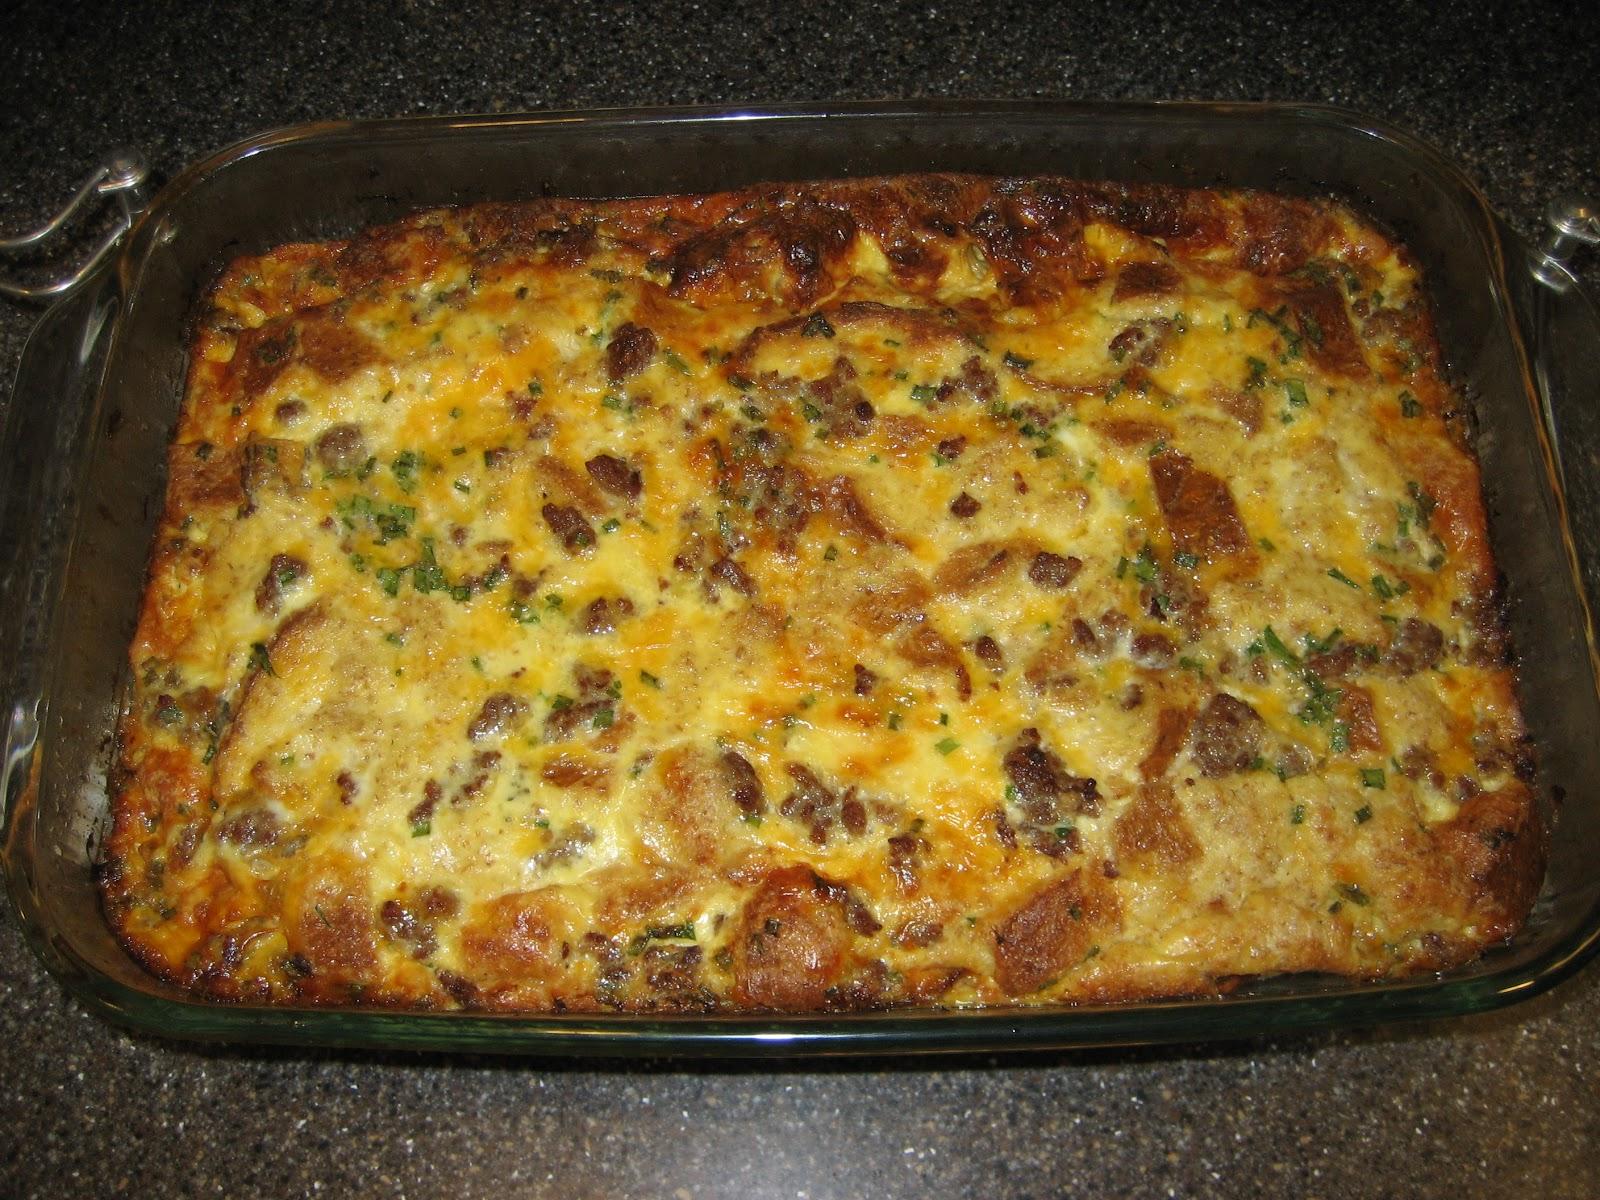 http://3.bp.blogspot.com/-eH5_CPCMH6Y/UNVFtiFX4bI/AAAAAAAABWQ/H8CaBBRxO-A/s1600/breakfast+casserole.jpg